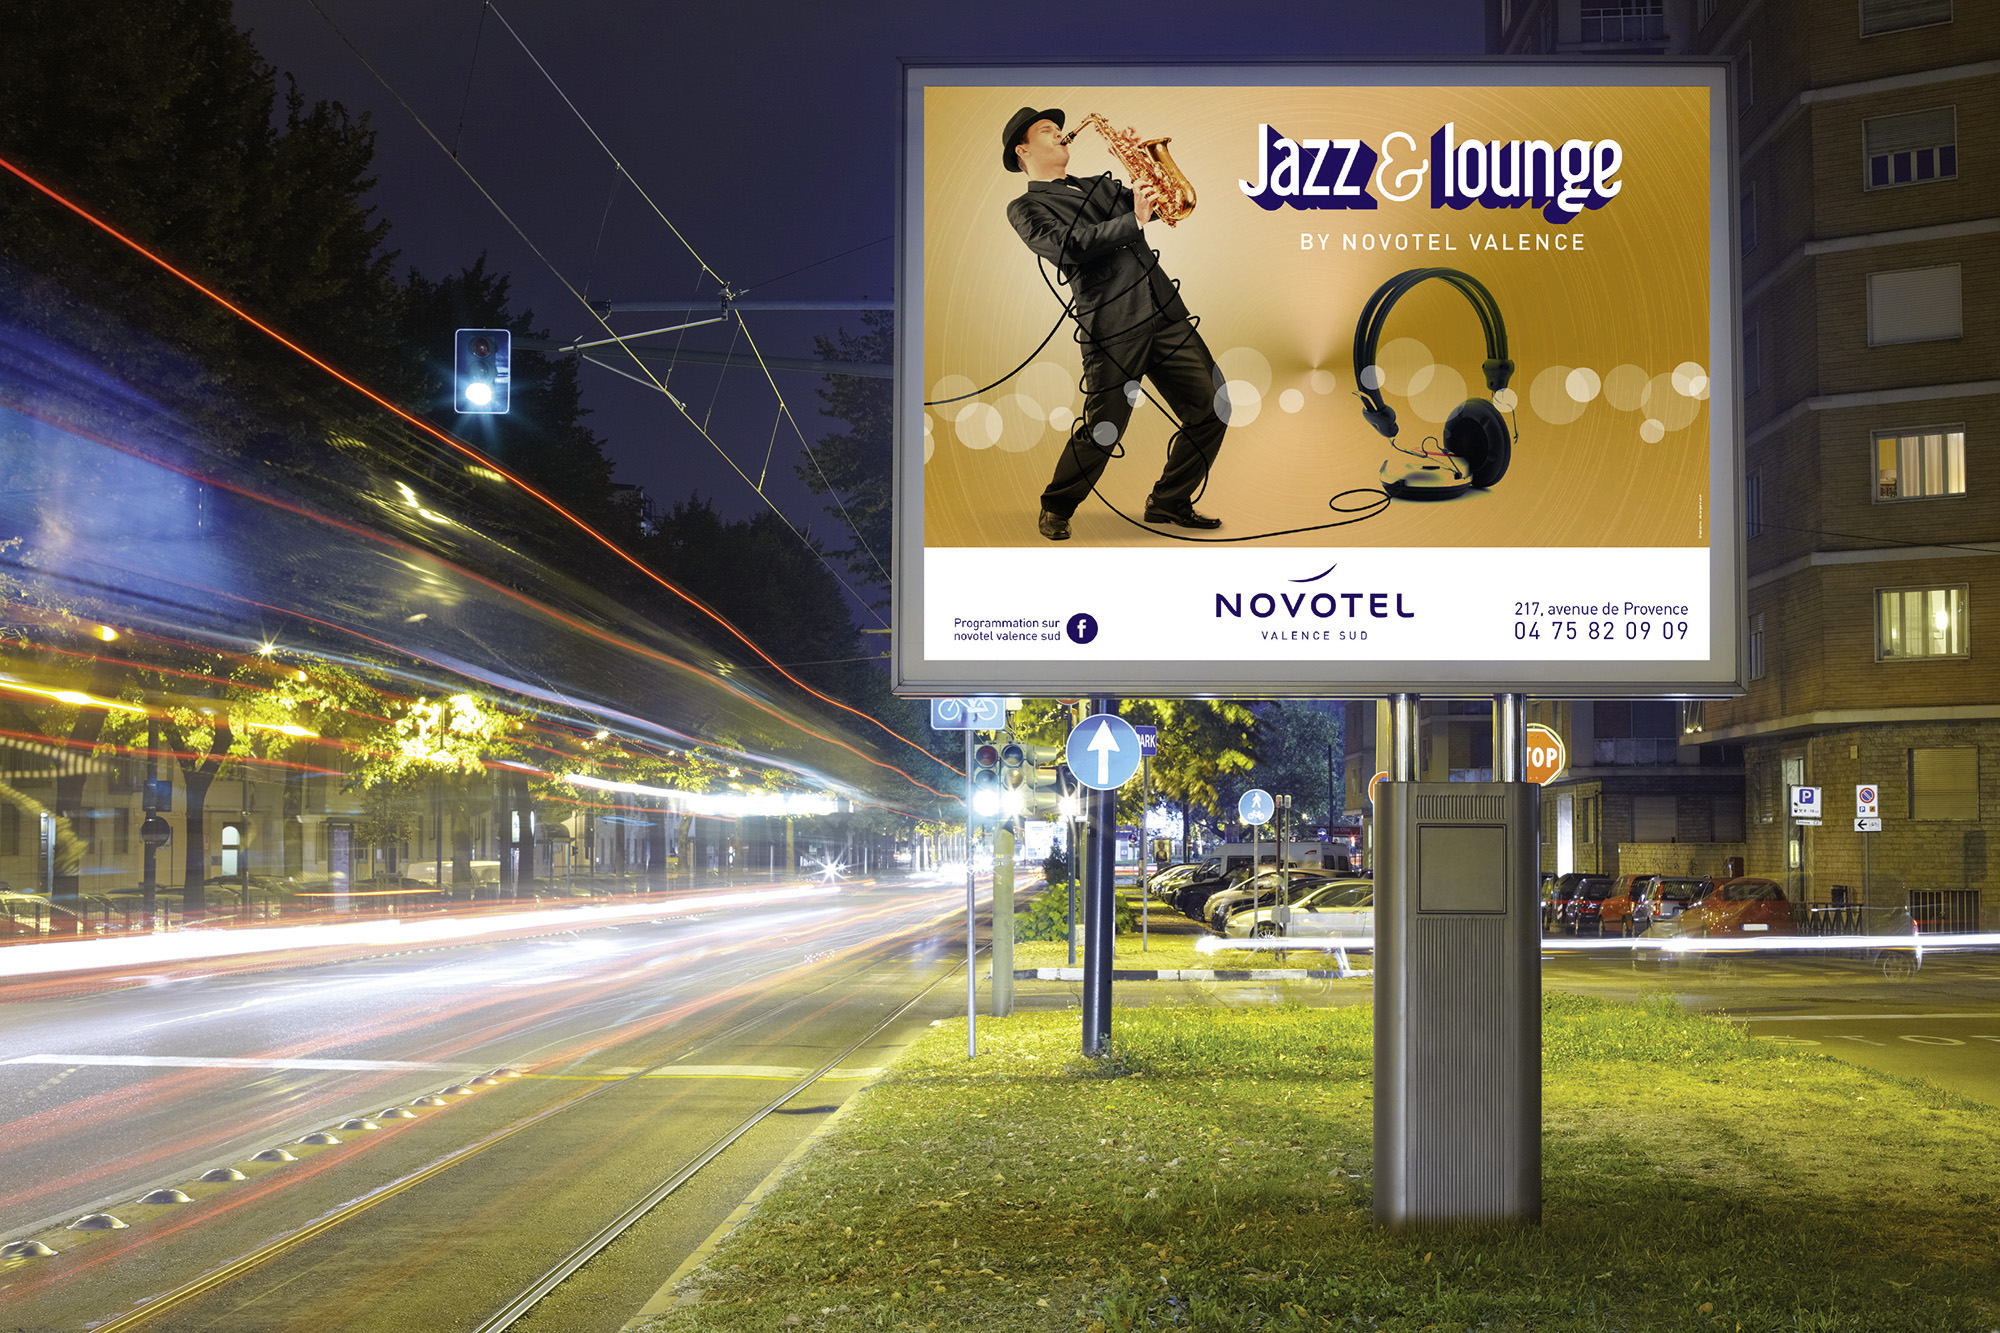 Soirées Jazz Novotel Valence